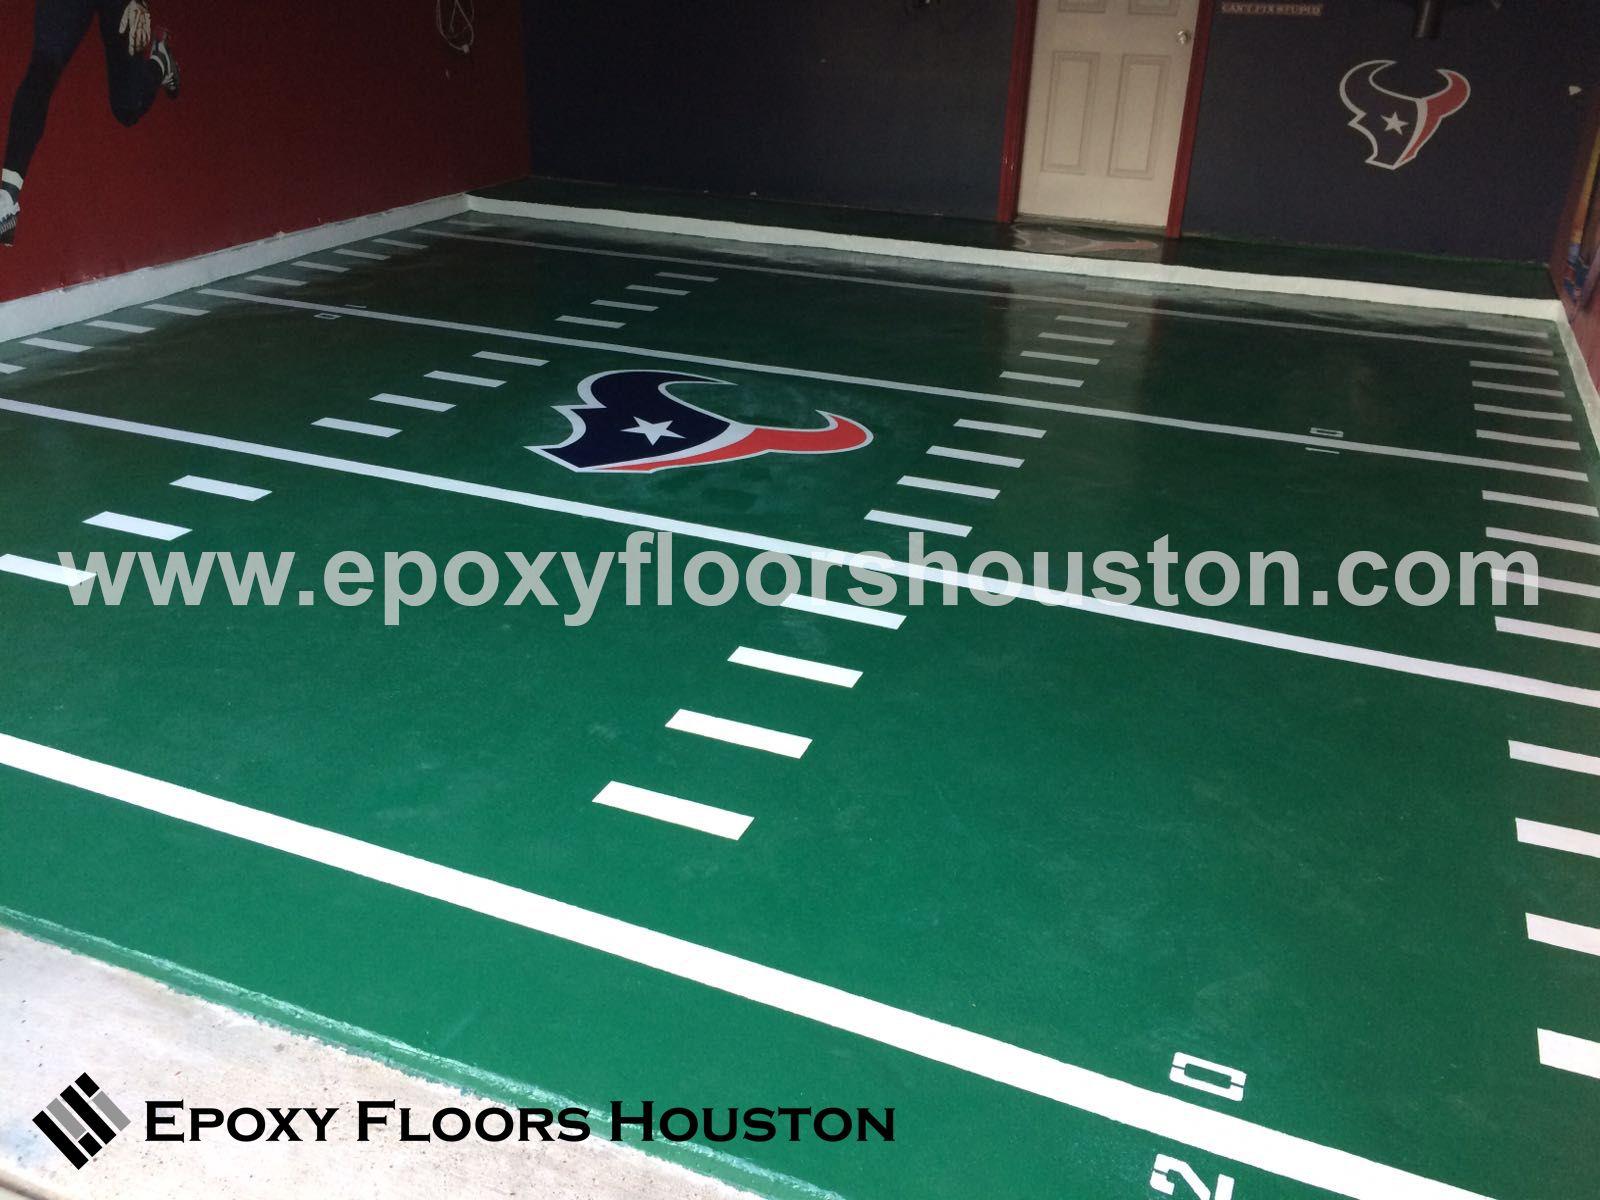 Flooring Services In Houston : Custom decals in epoxy flooring houston tx